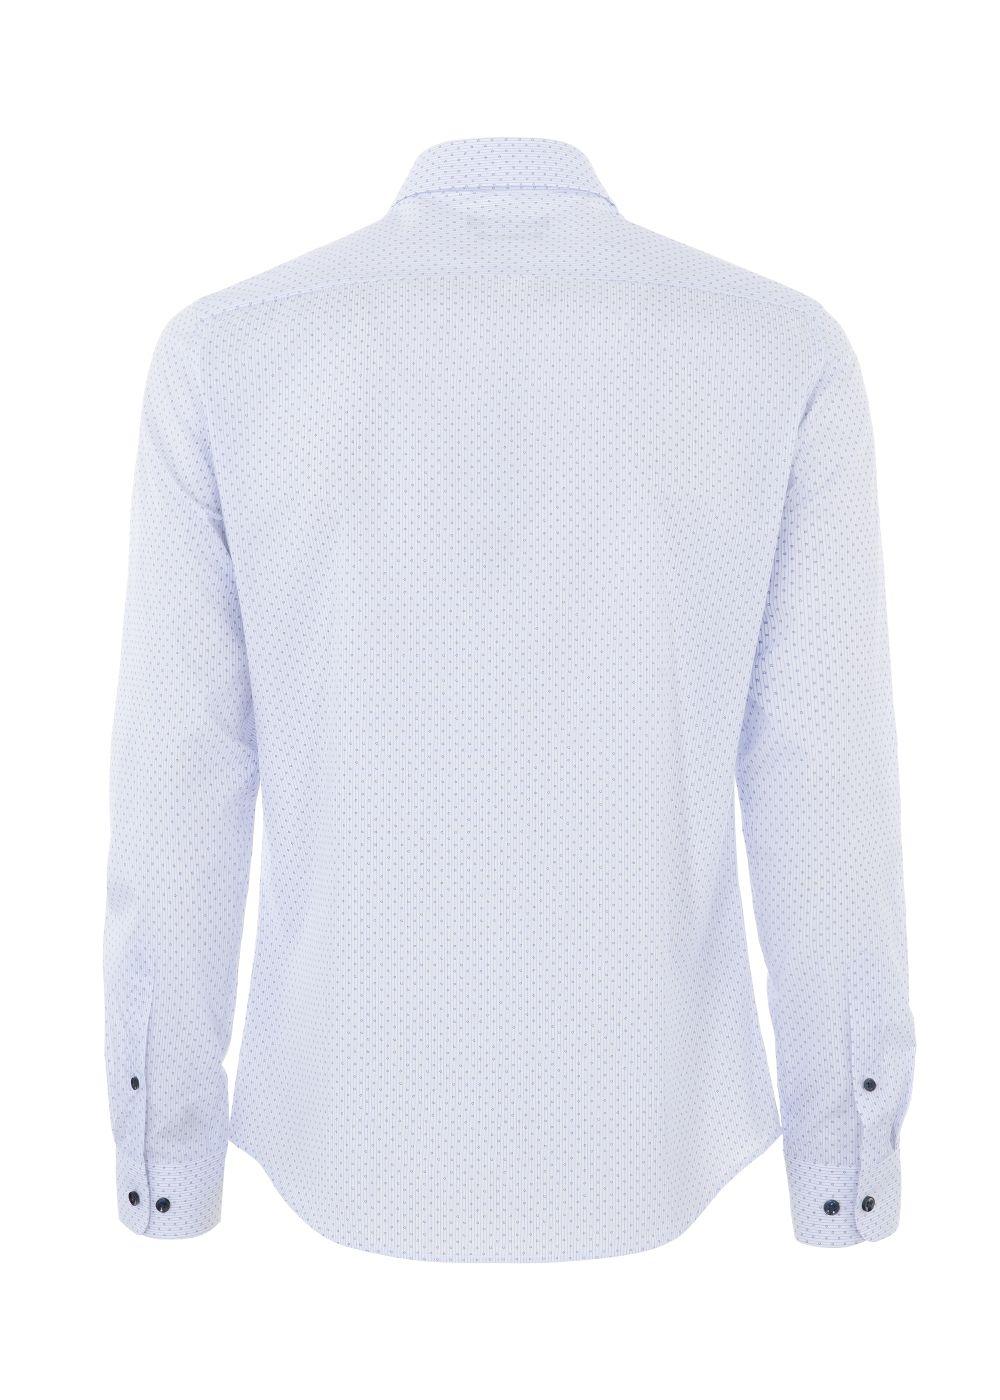 Koszula męska KOSMT-0246-16(W21)